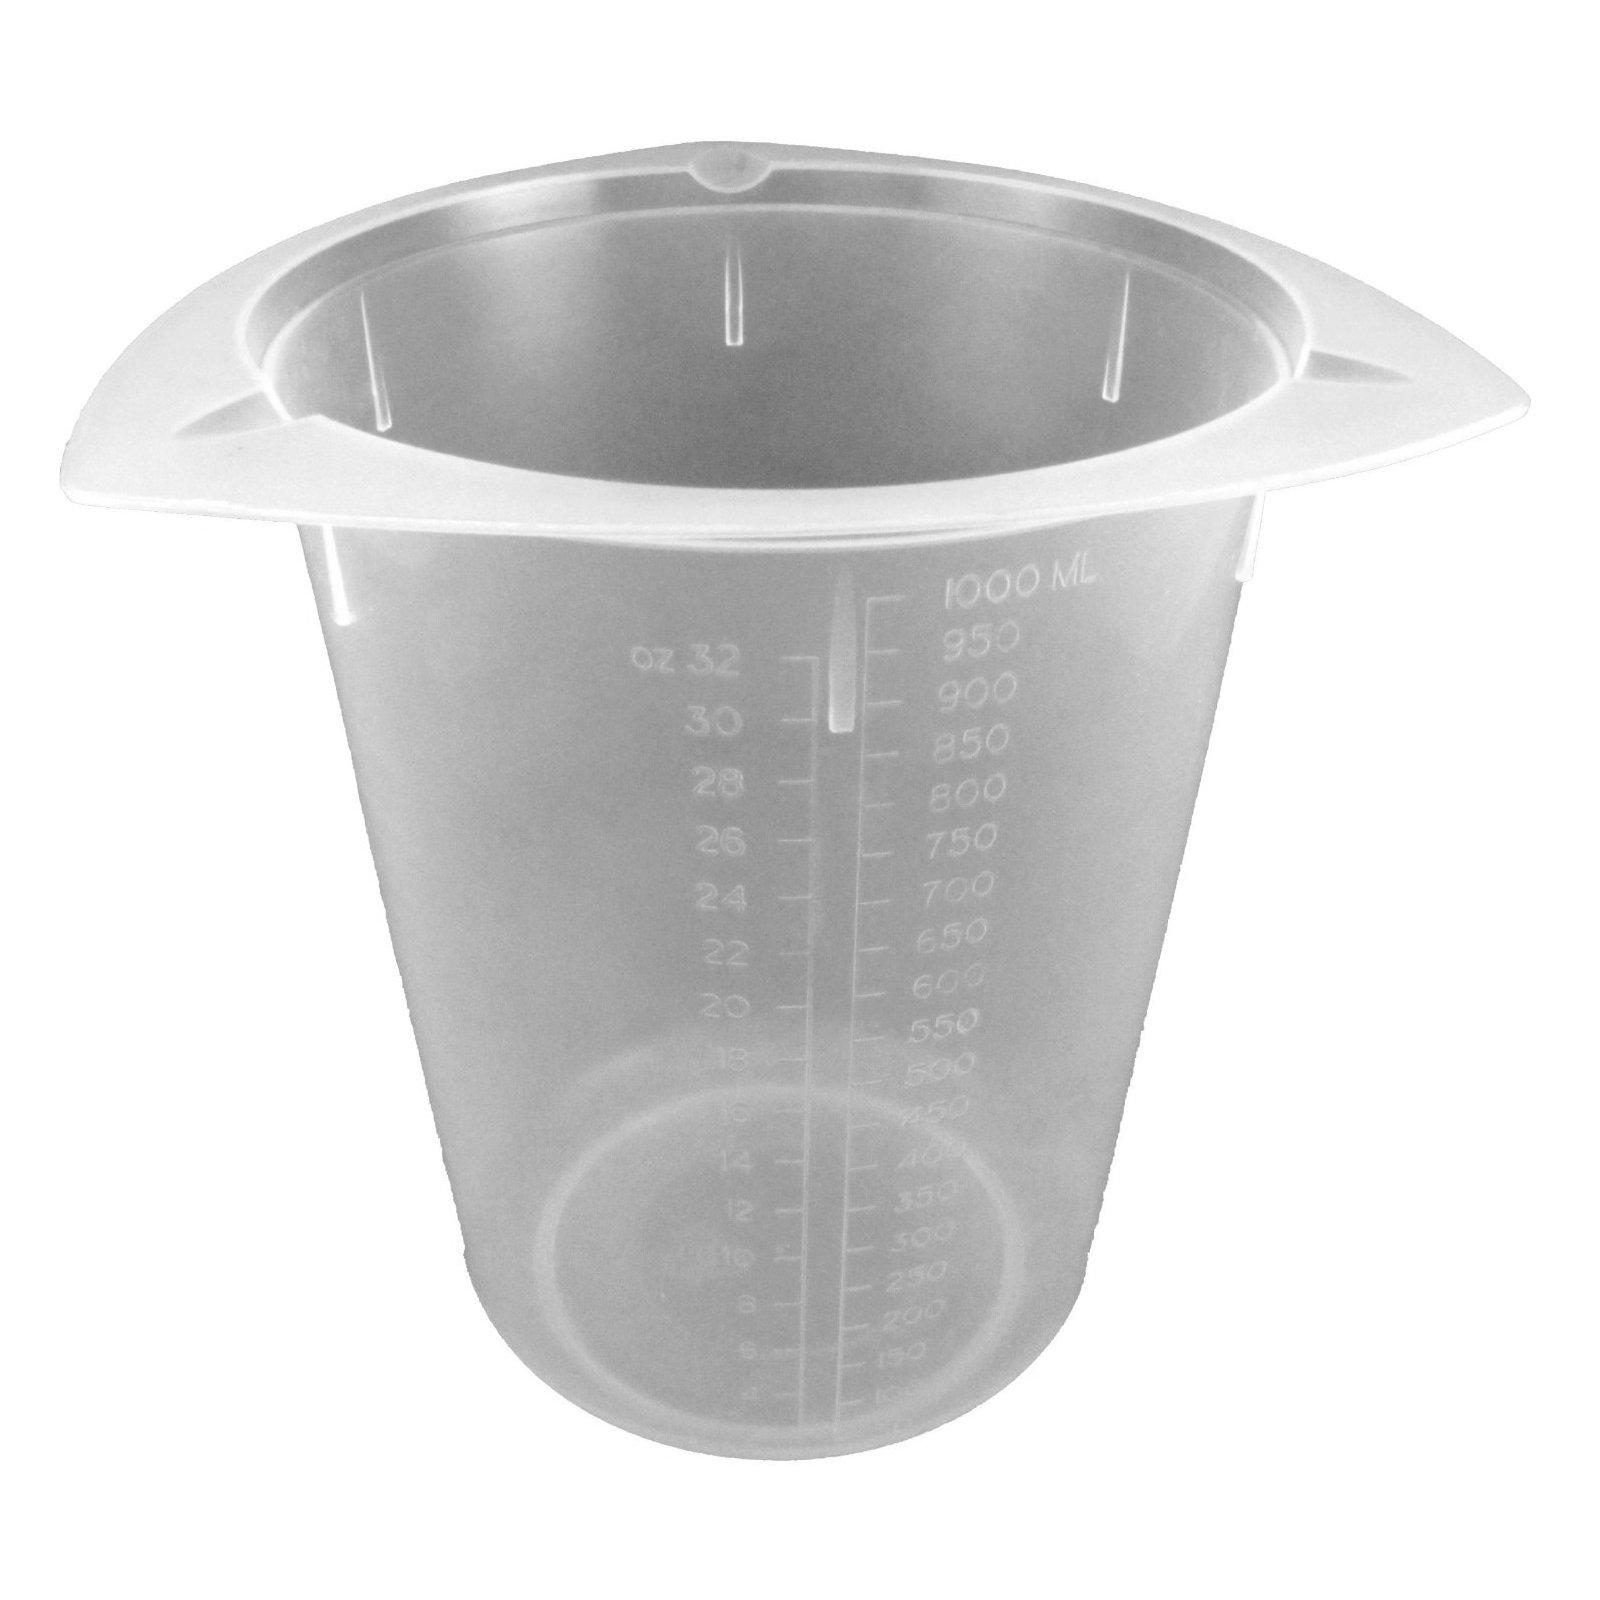 Dyn-A-Med 80098 Polypropylene Tri-Pour Disposable Beaker, 1000mL Capacity (Case of 100)